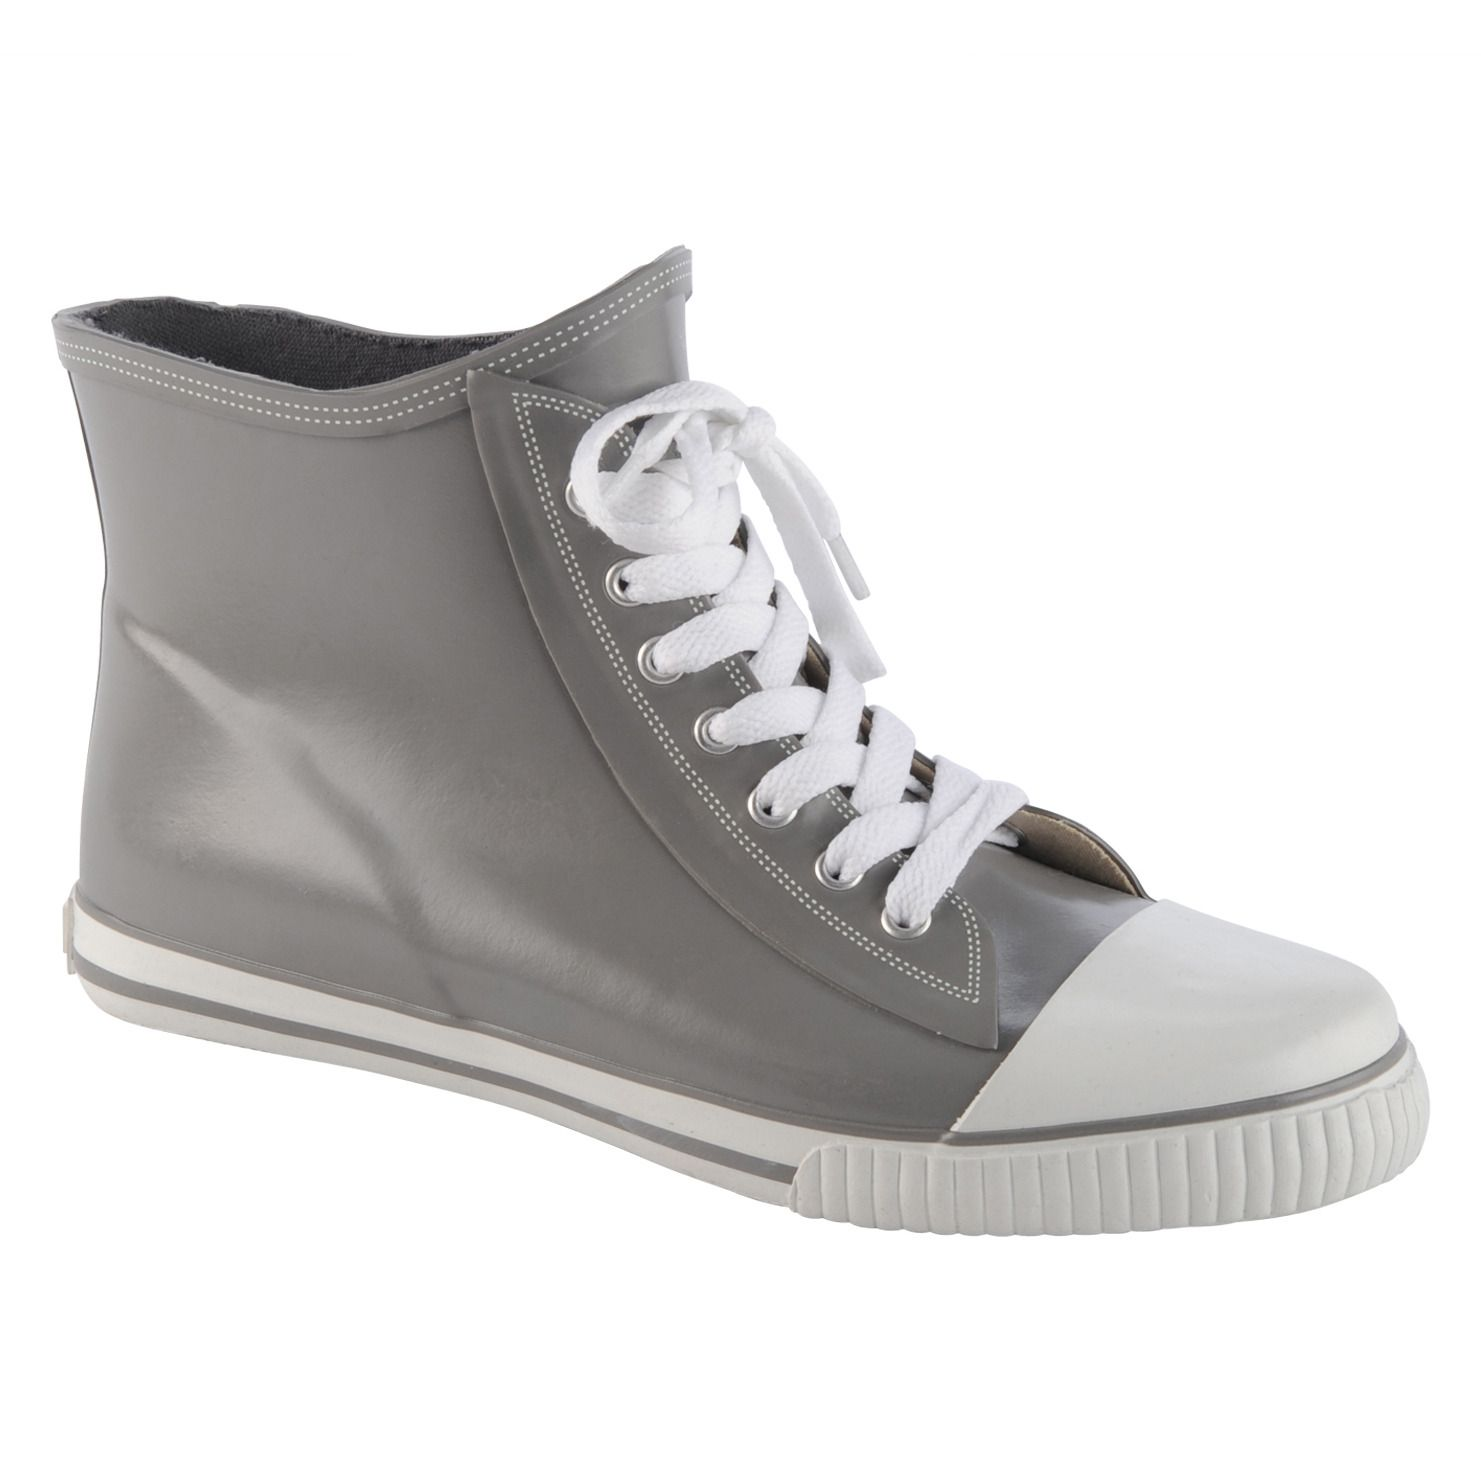 c7fadaaa8892 SCARPONE rain sneakers - sale s sale boots women for sale at ALDO Shoes.  20